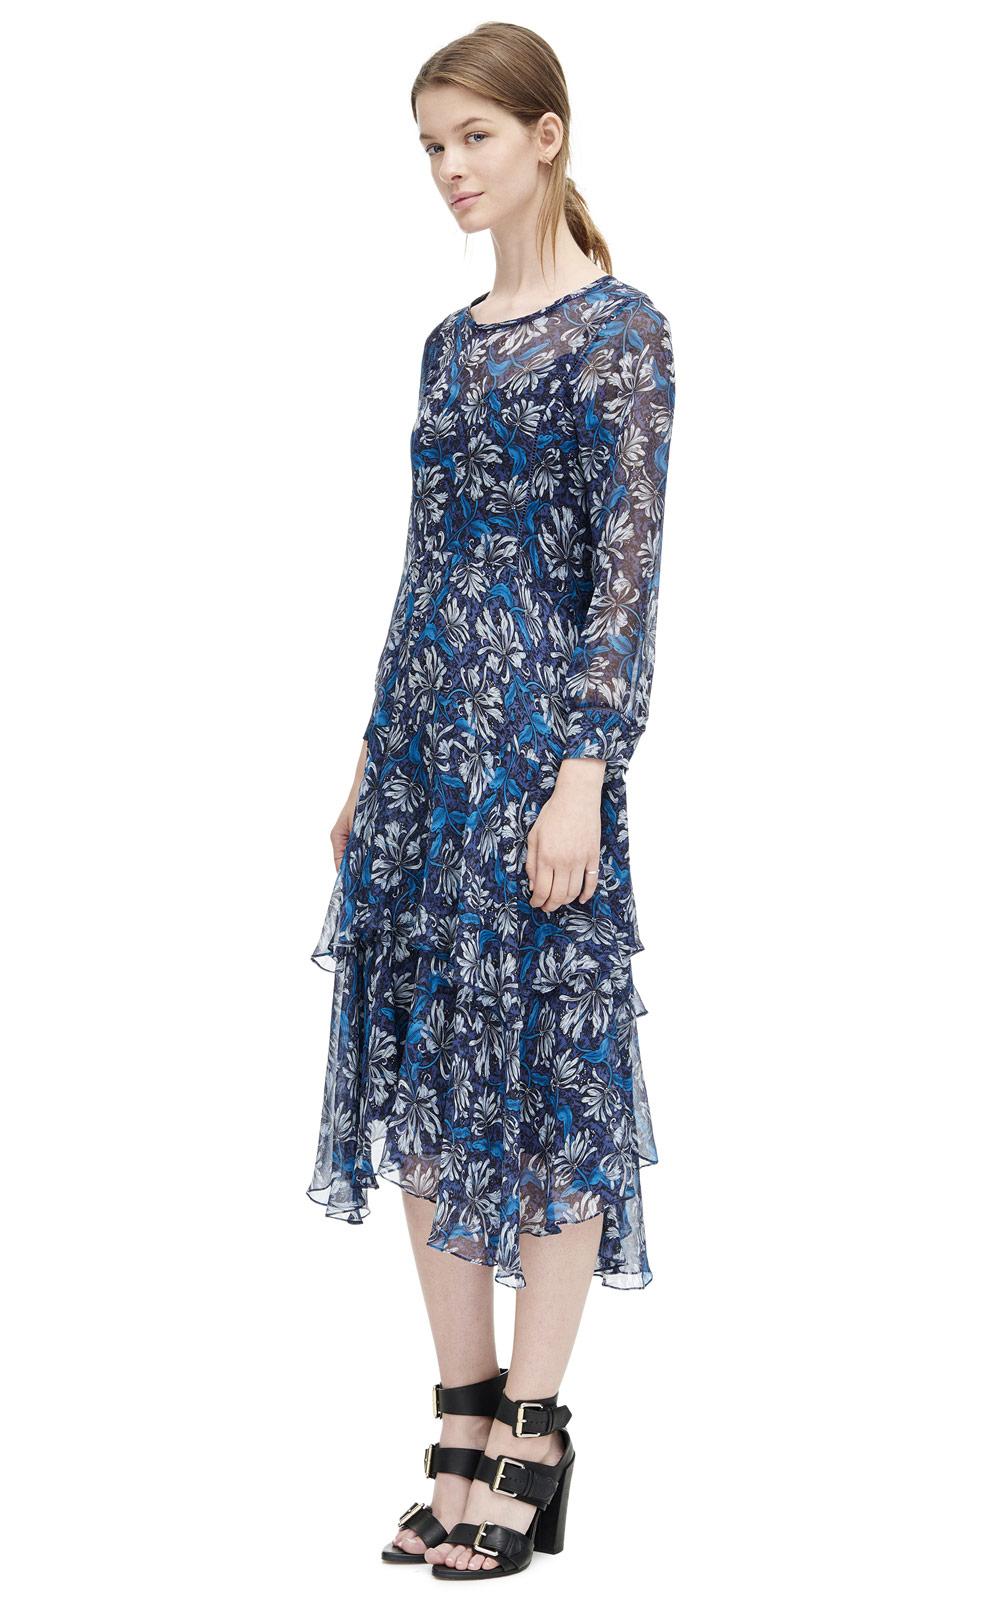 Rebecca taylor Long Sleeve Mystic Garden Chiffon Dress in Blue - Lyst